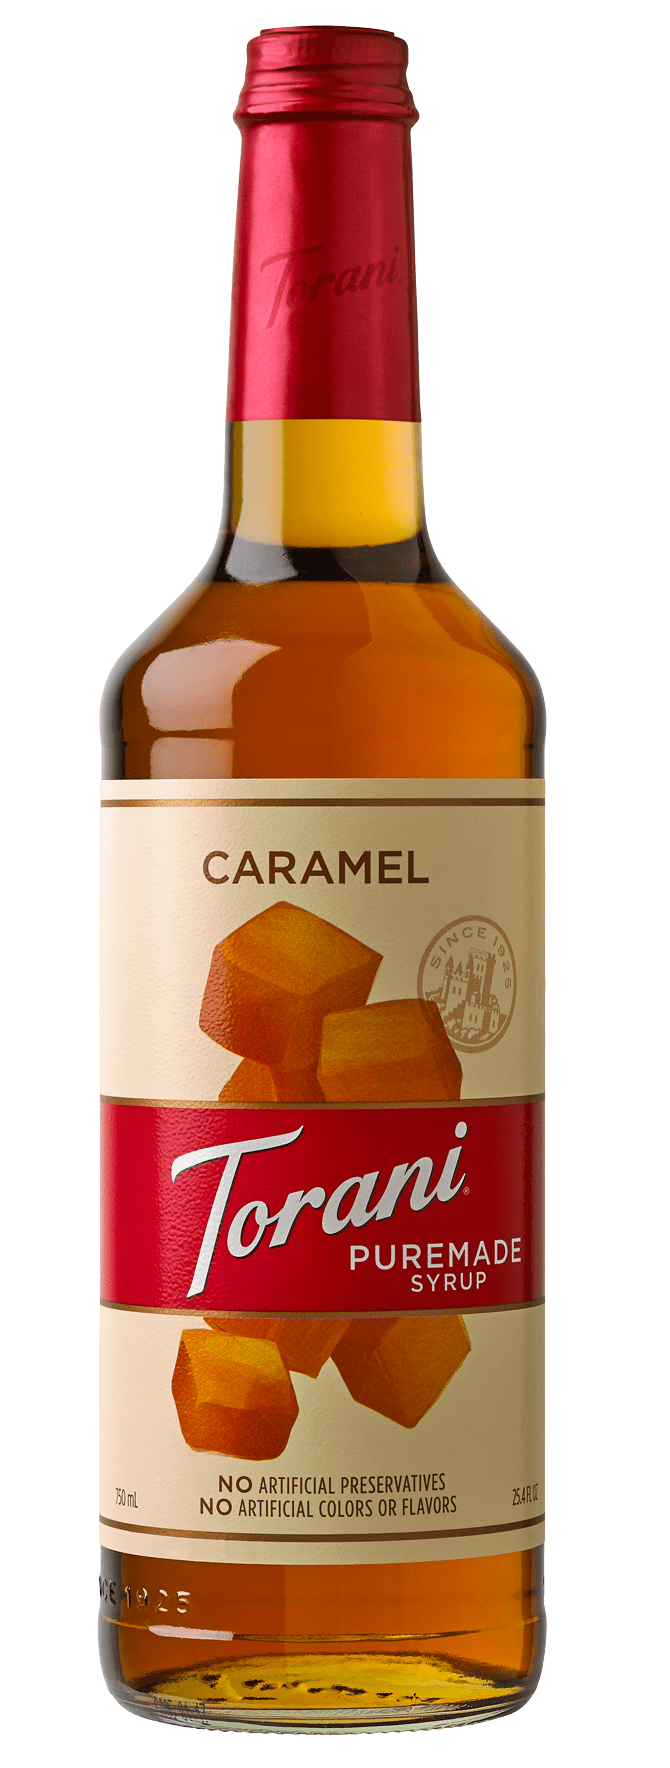 Caramel Puremade Syrup image